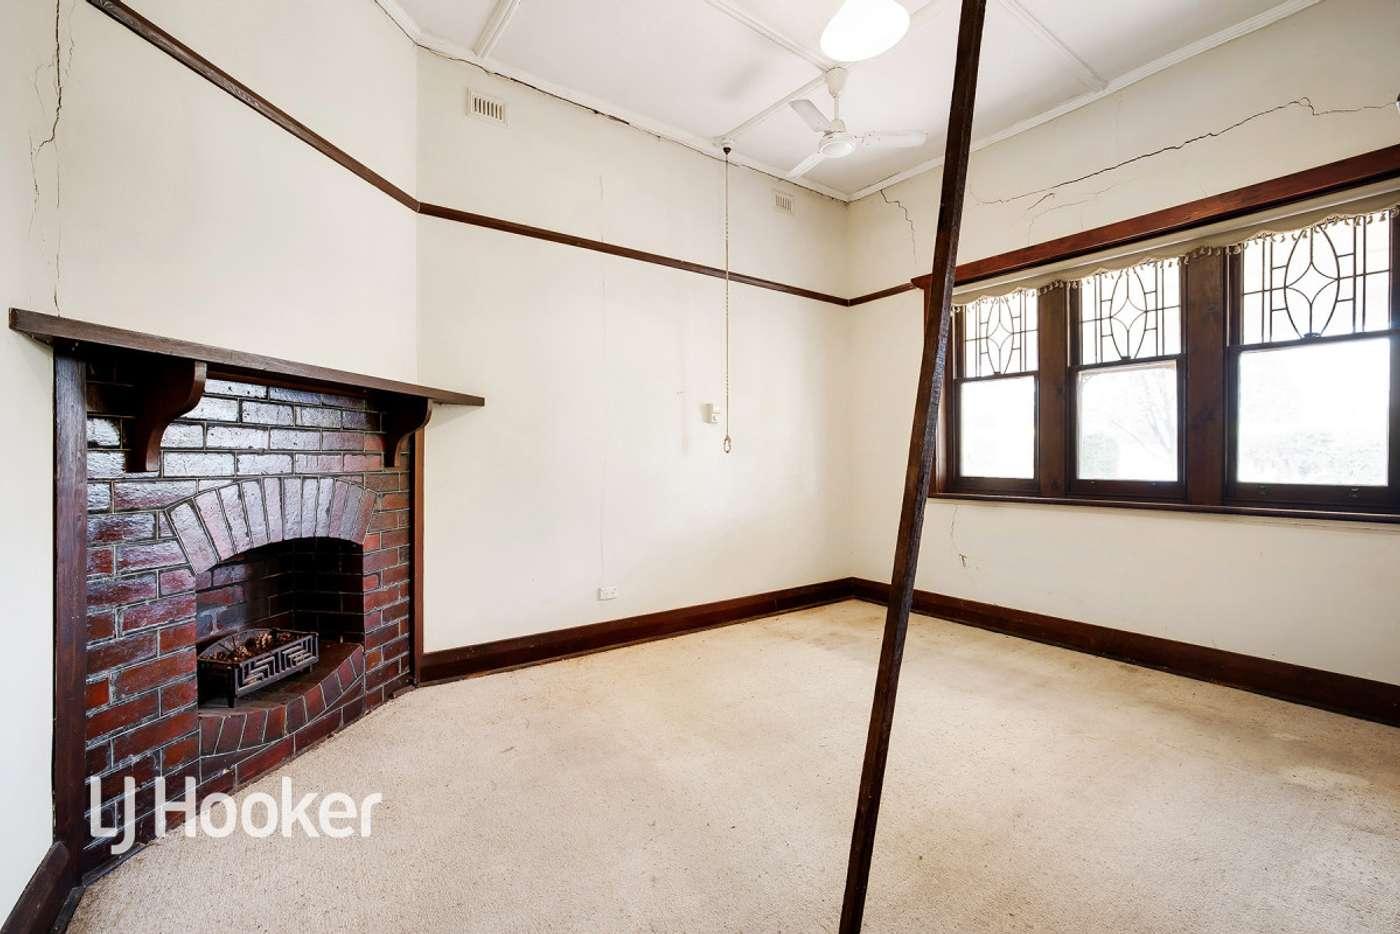 Sixth view of Homely house listing, 28 Albermarle Avenue, Trinity Gardens SA 5068